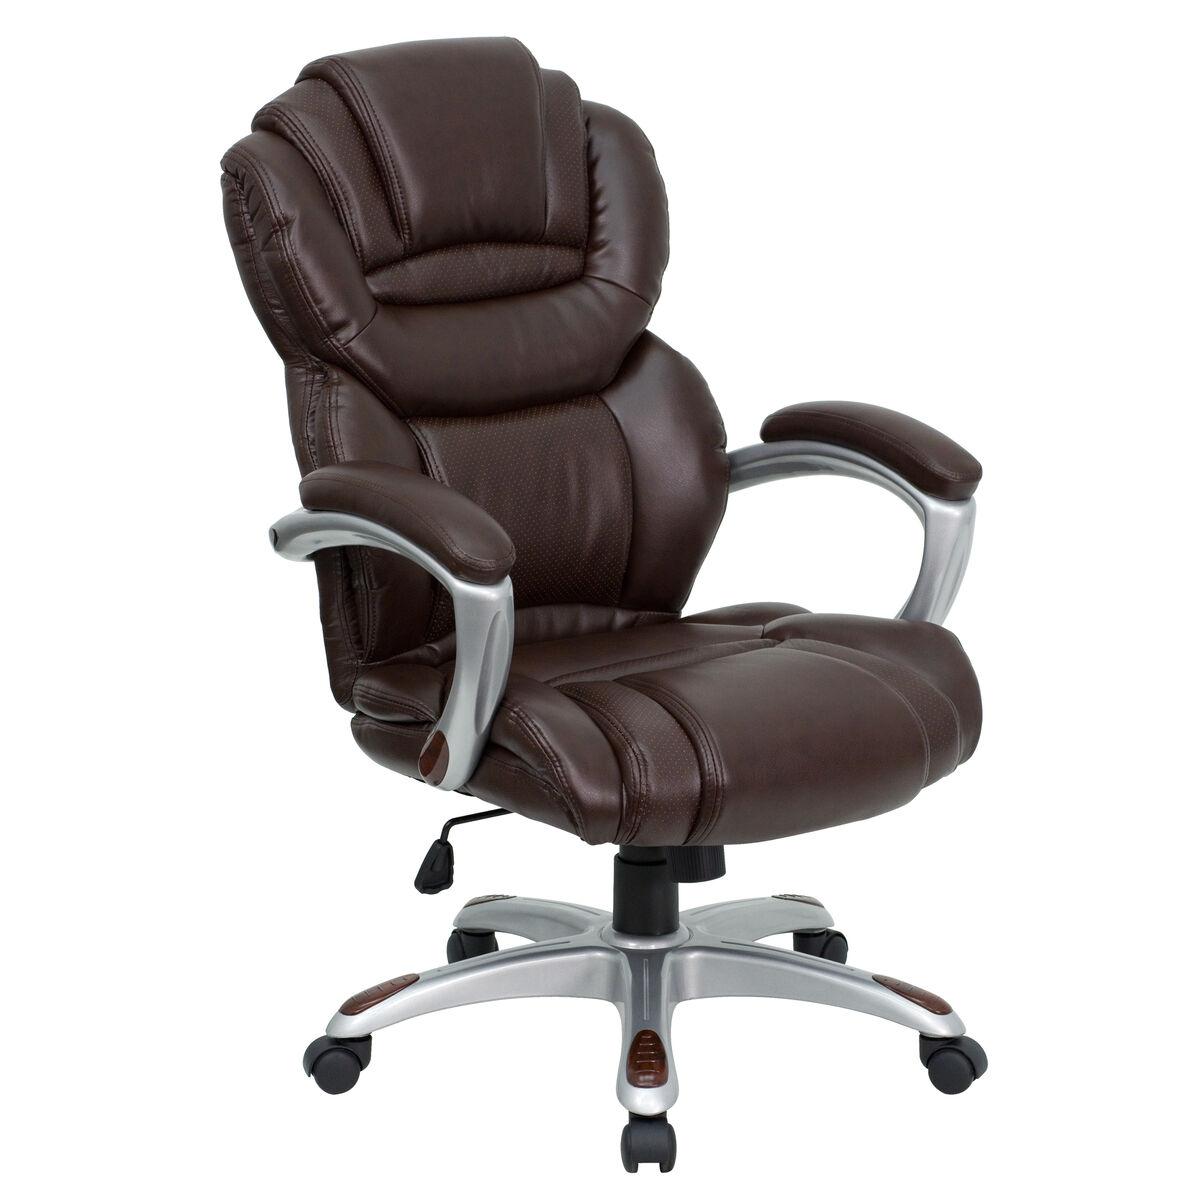 brown high back leather chair go 901 bn gg bizchair com